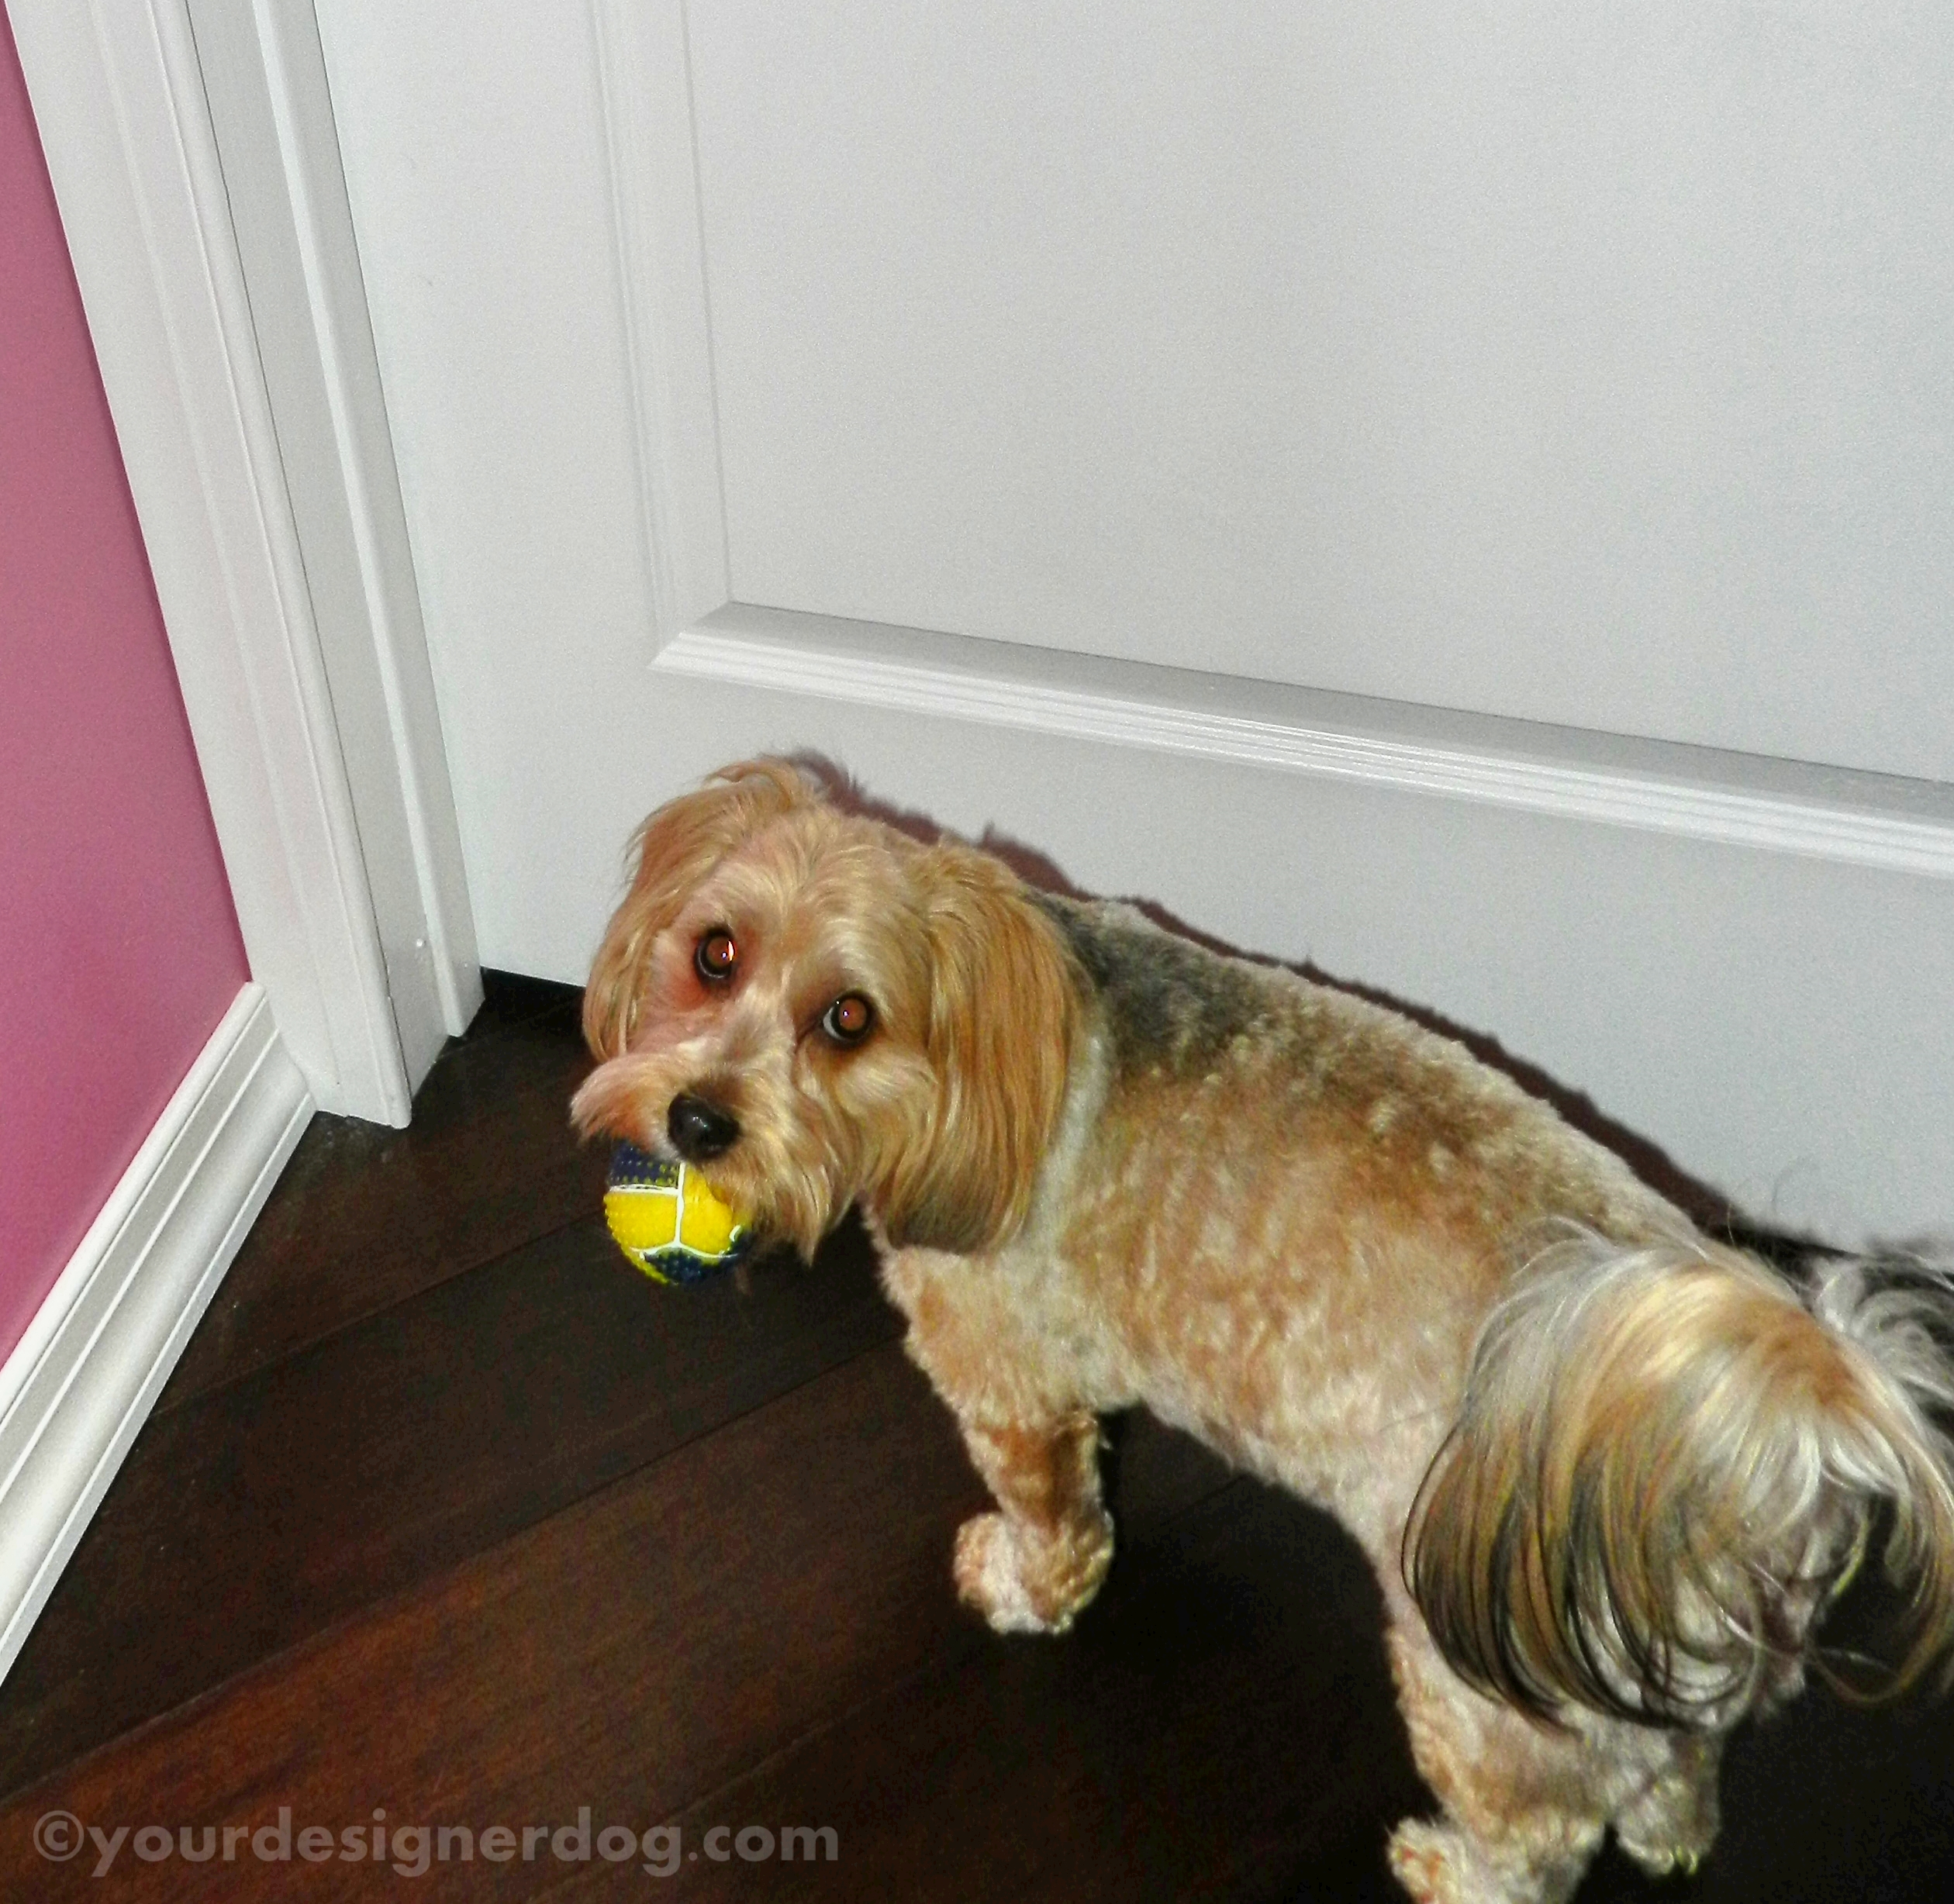 Please Mom, I Desperately Need a New Toy!